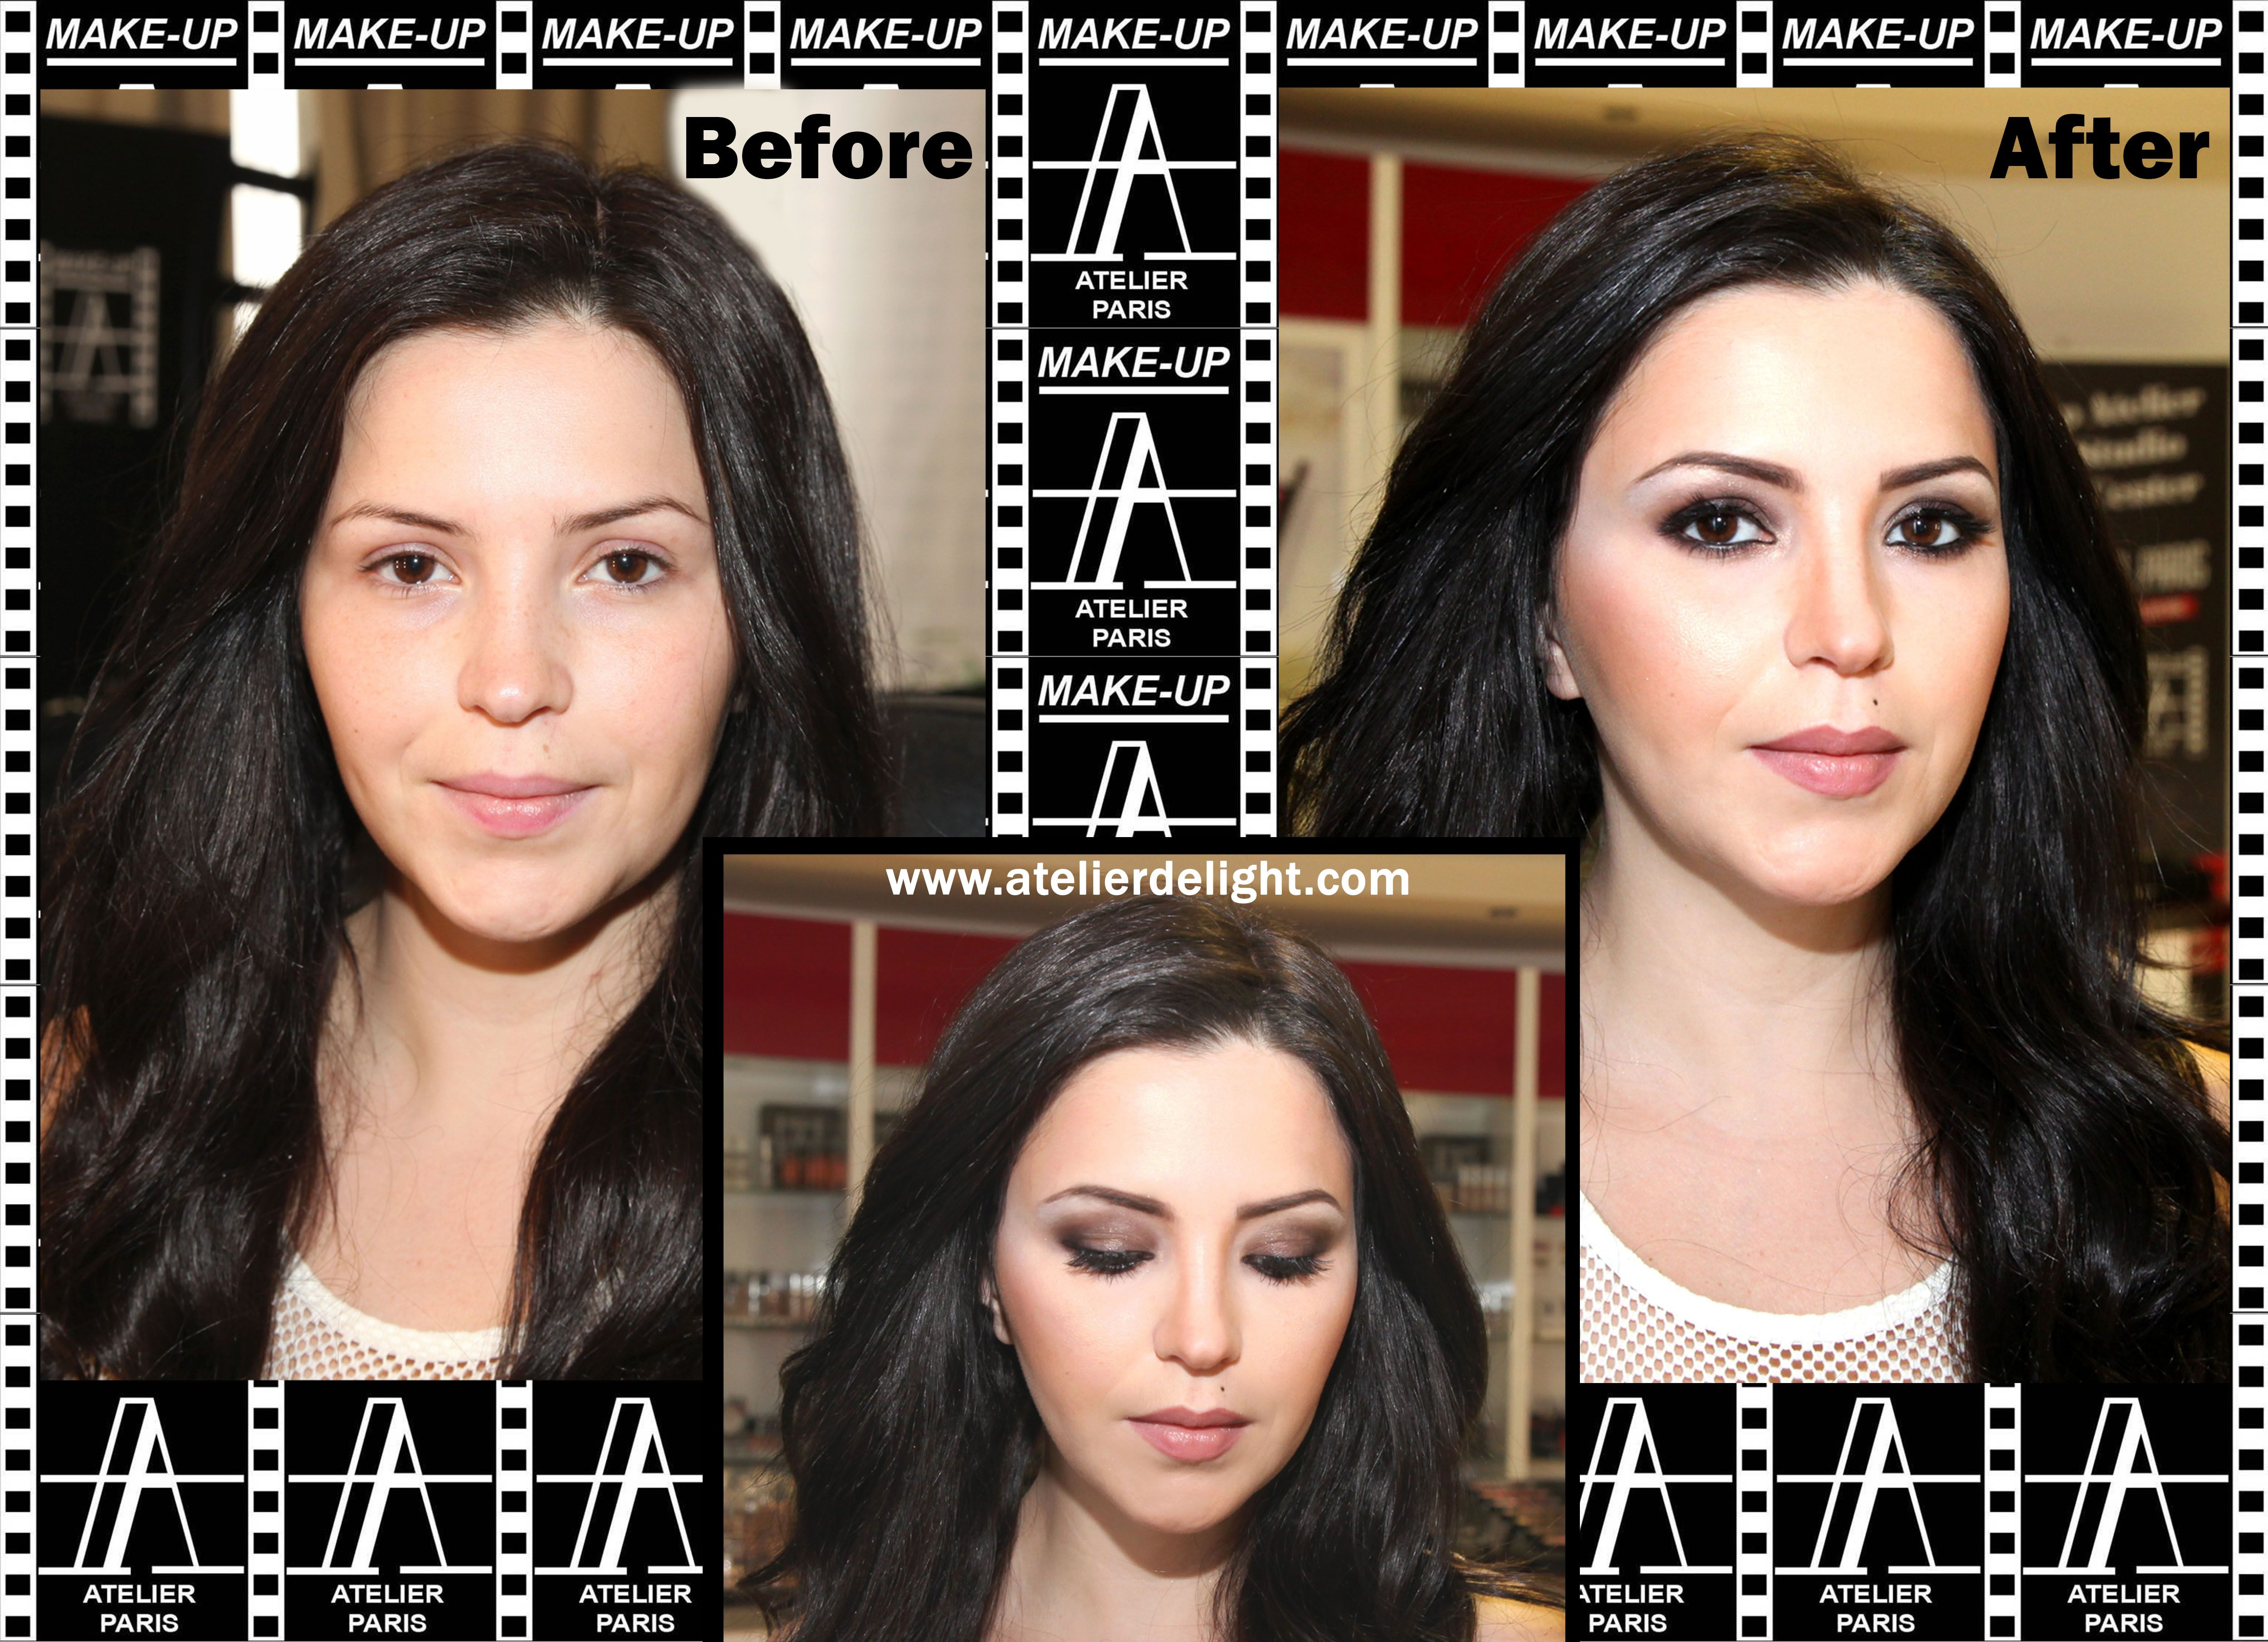 MakeUp Atelier Training Center shows the perfect makeup